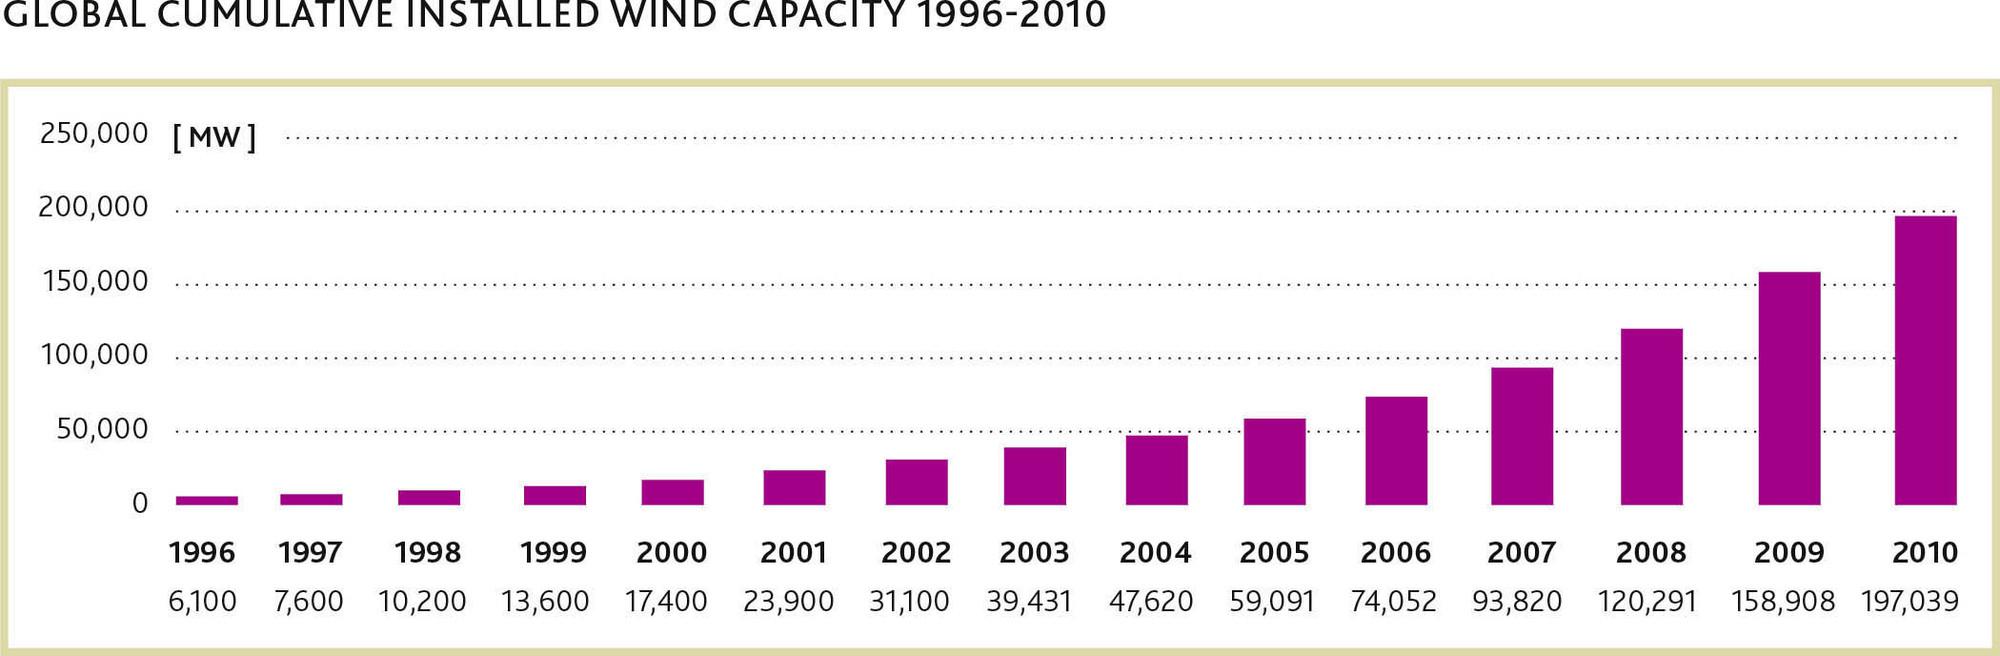 Cumulative Installed Wind Capacity 1996 2010